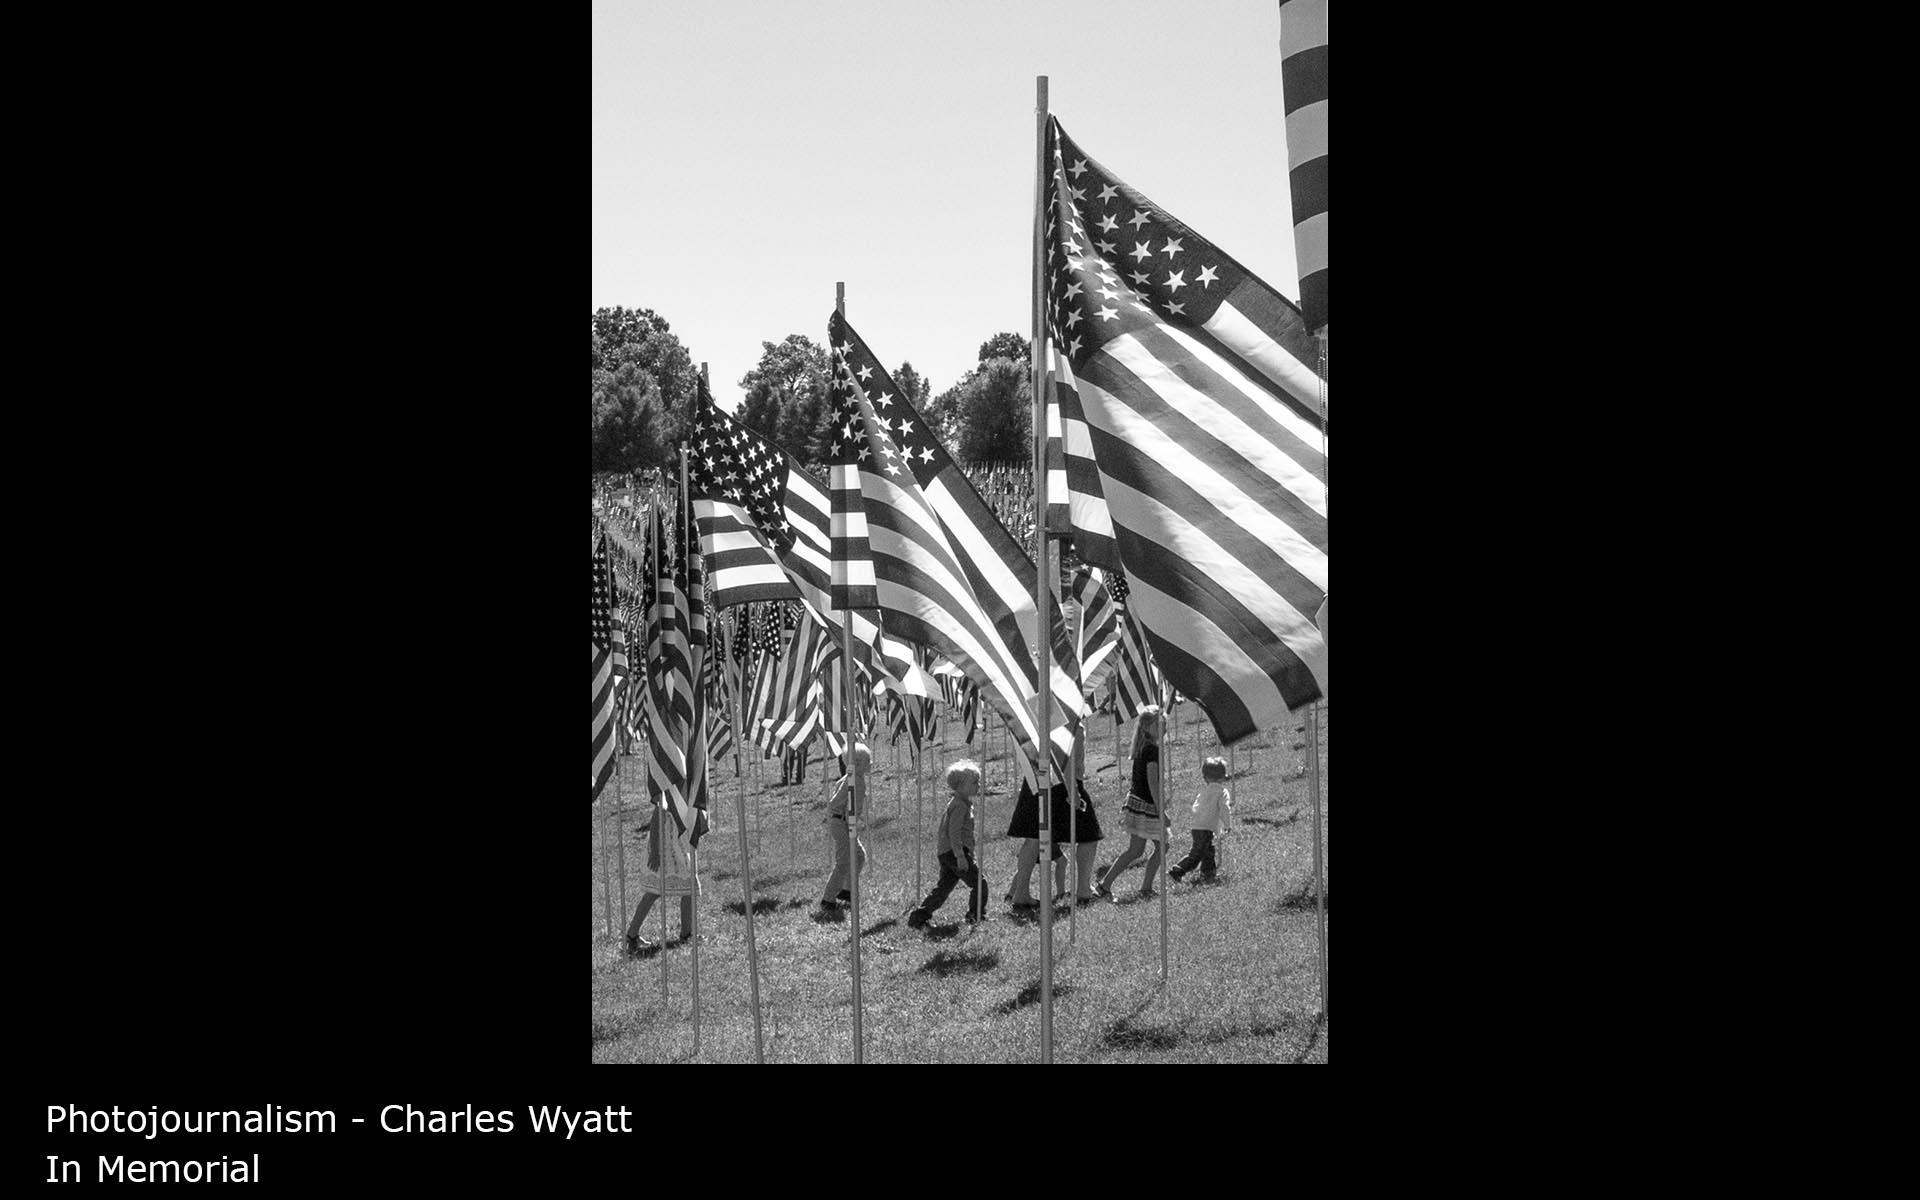 In Memorial  - Charles Wyatt